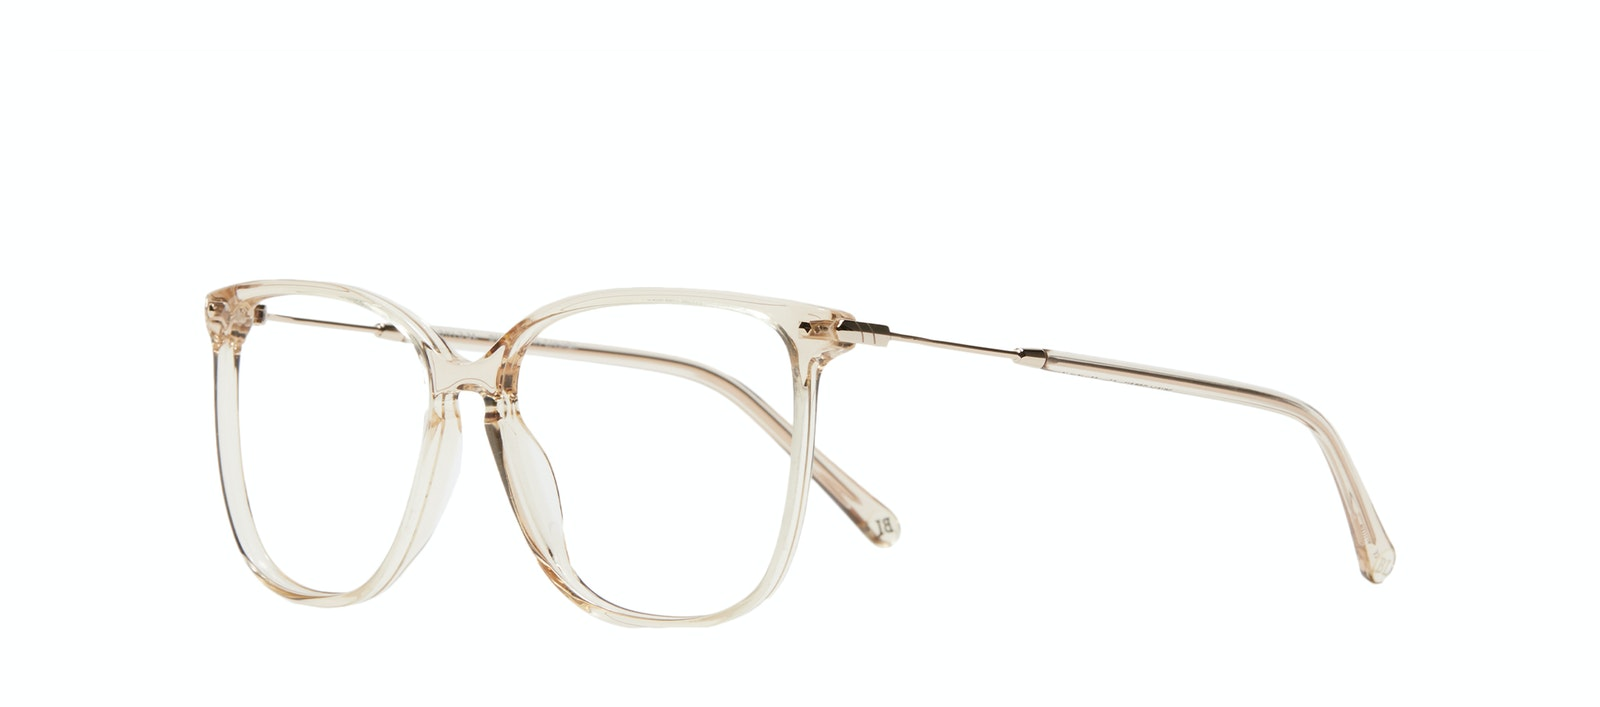 Affordable Fashion Glasses Square Eyeglasses Women Sonia XS Blush Tilt